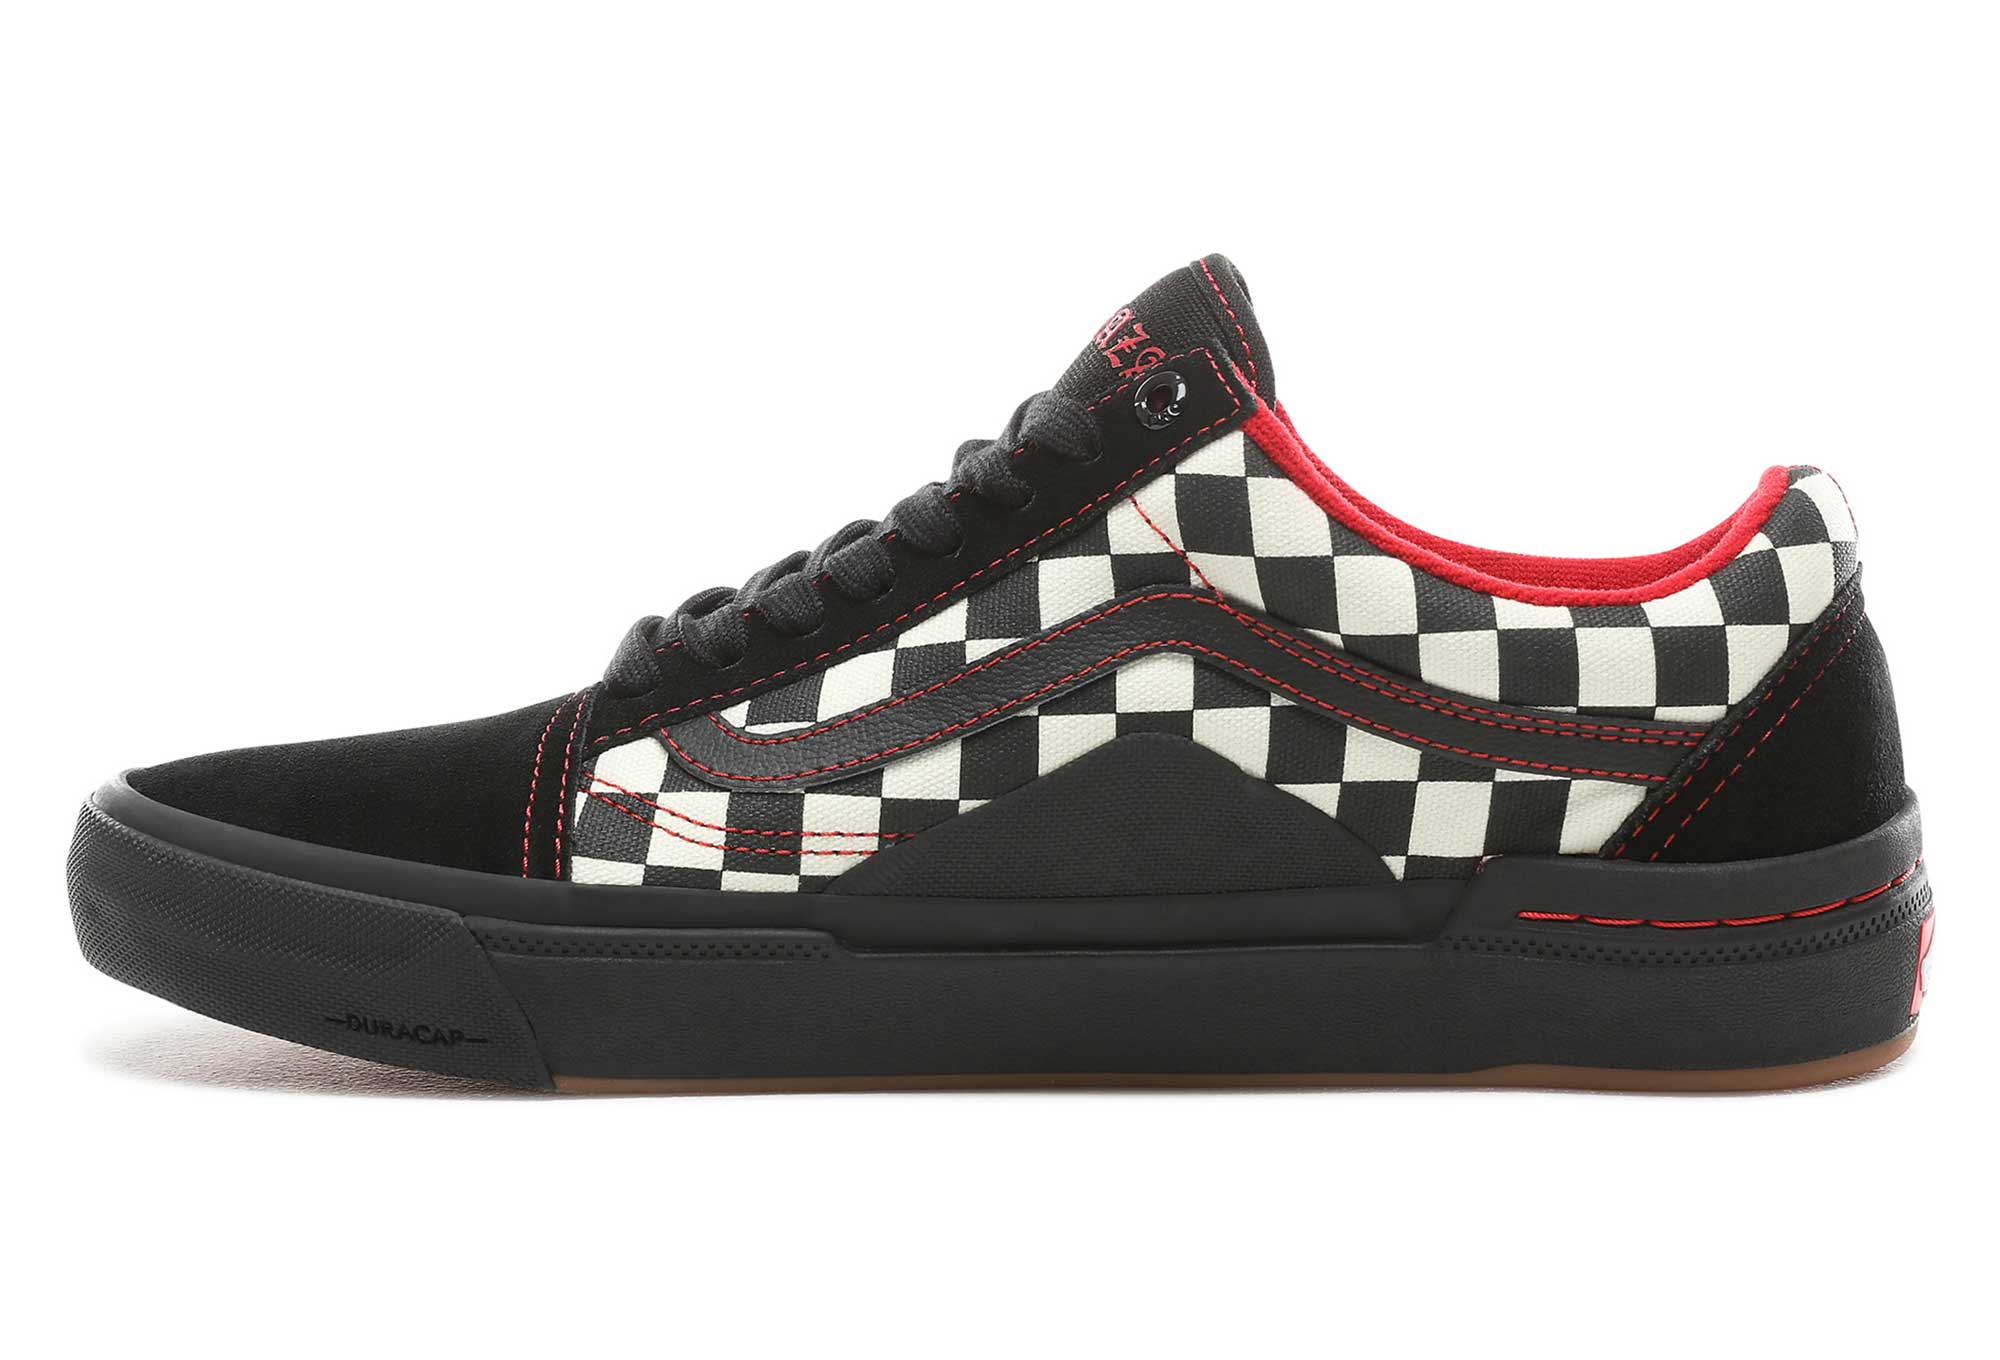 5431a60052a11 Vans Old Skool Pro Shoes BMX Kevin Peraza Black / White | Alltricks.com